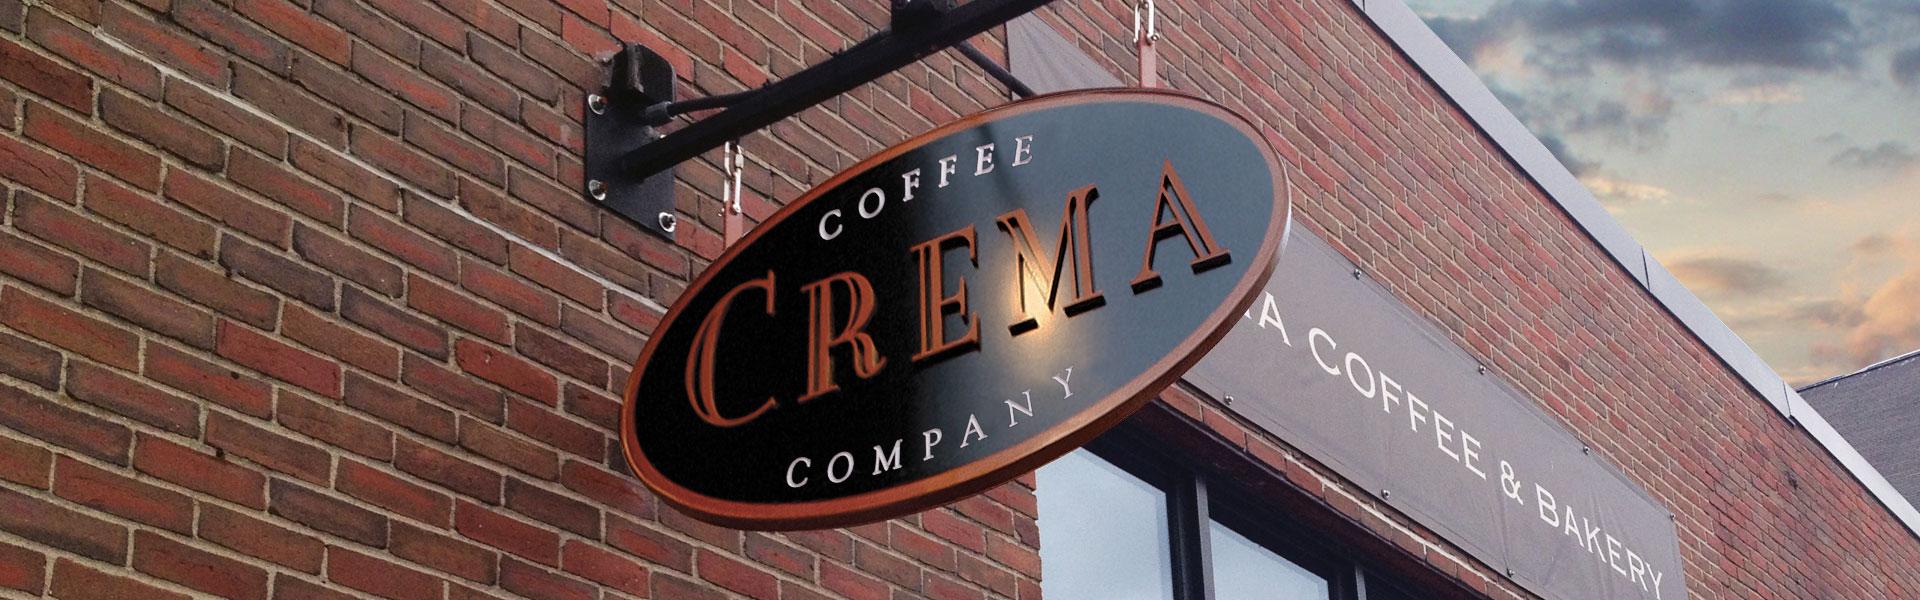 Crema Coffee Company signage